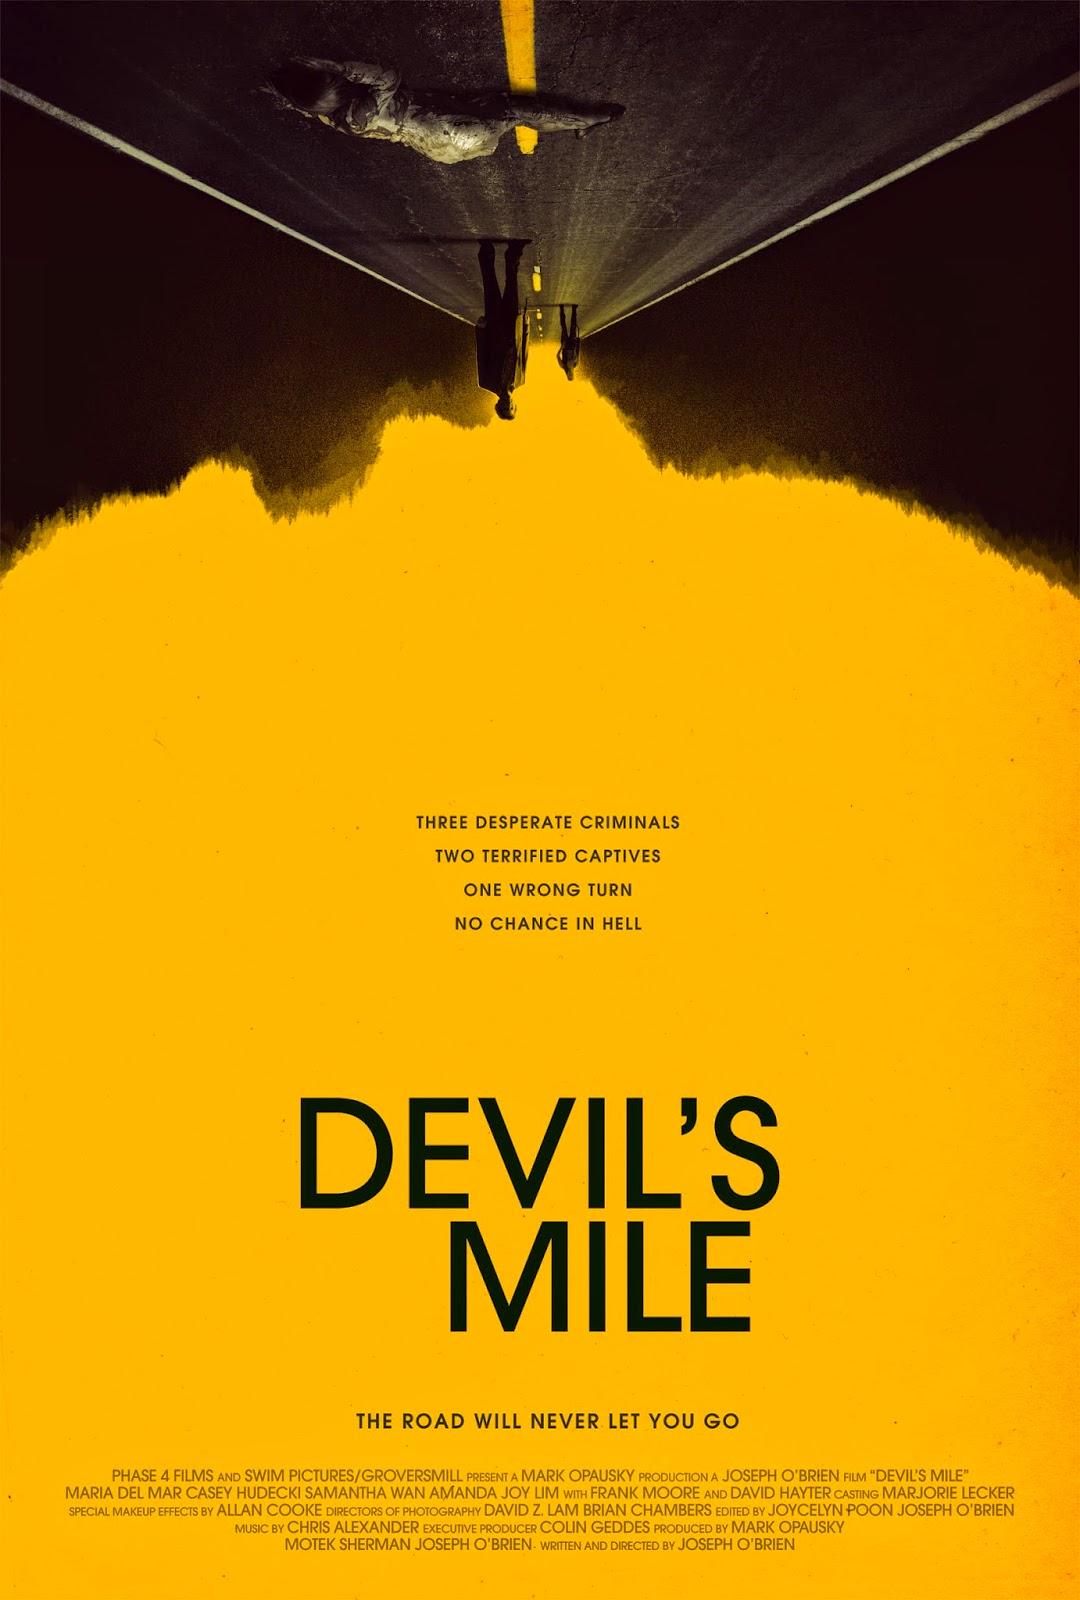 Devils Mile / Devil's Mile (2014) ταινιες online seires oipeirates greek subs